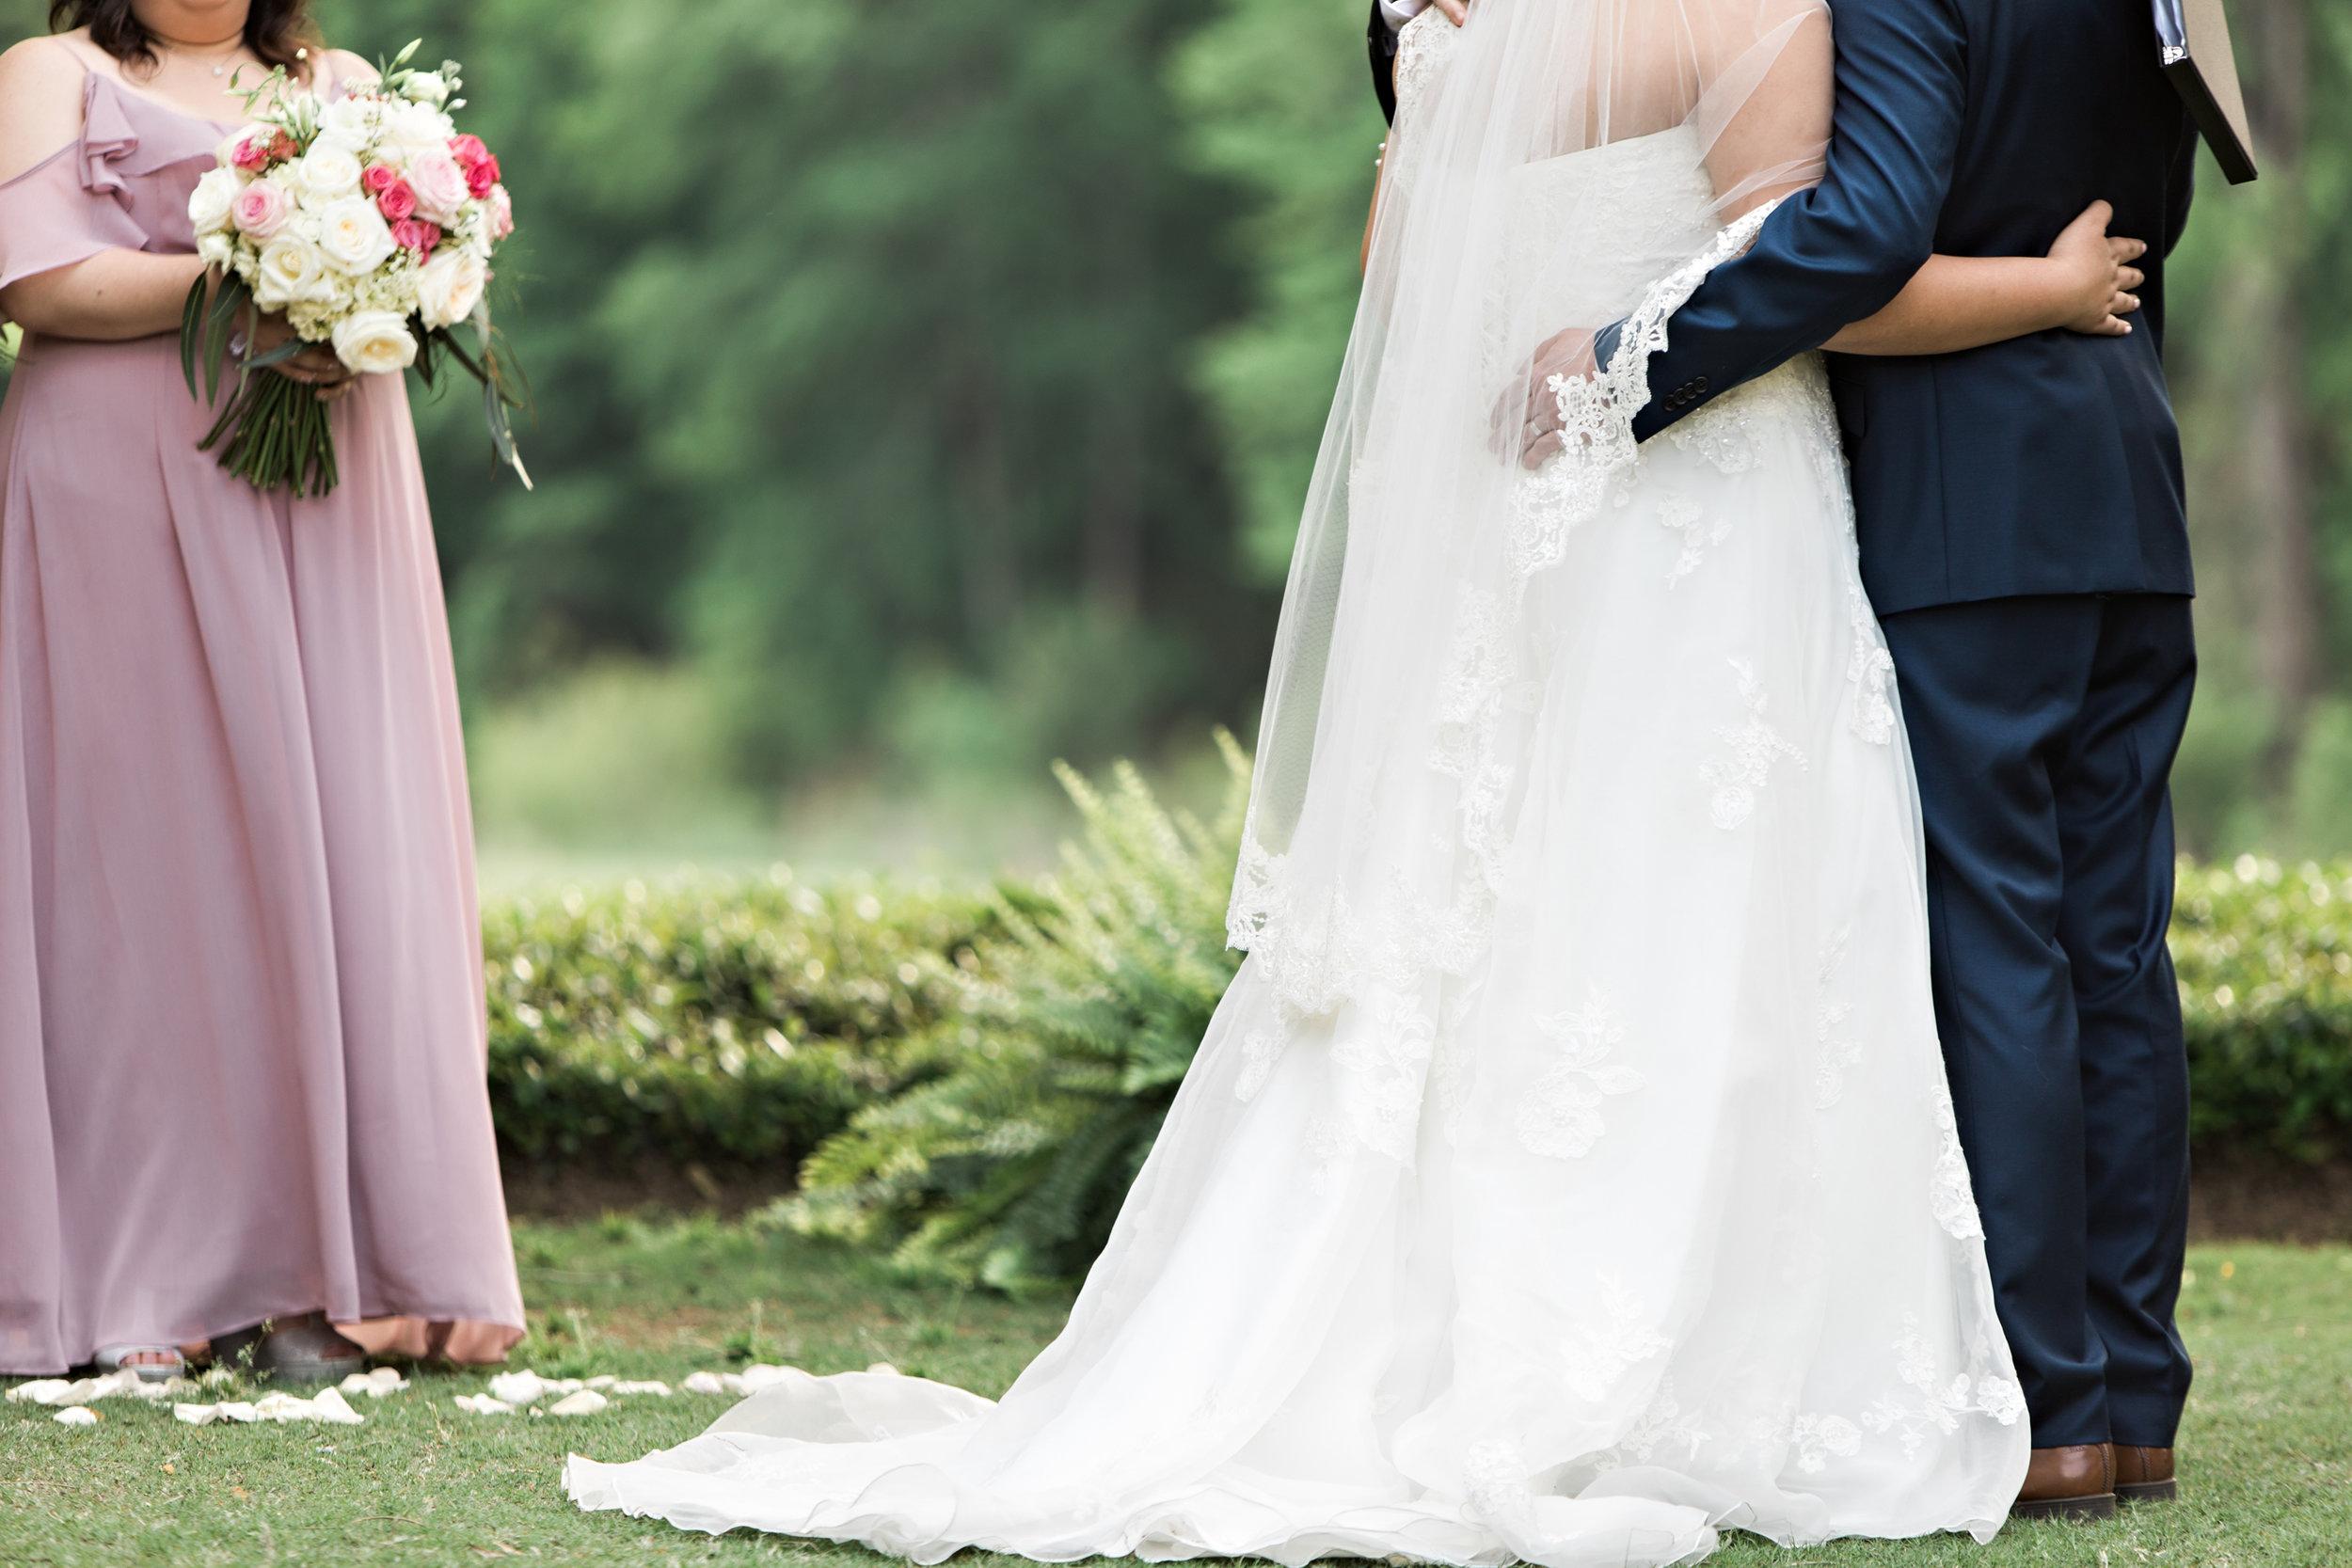 Ni ck-Drollette-Photography-Auburn-Alabama-Weddings-Sylvia-Kevin-150.jpg